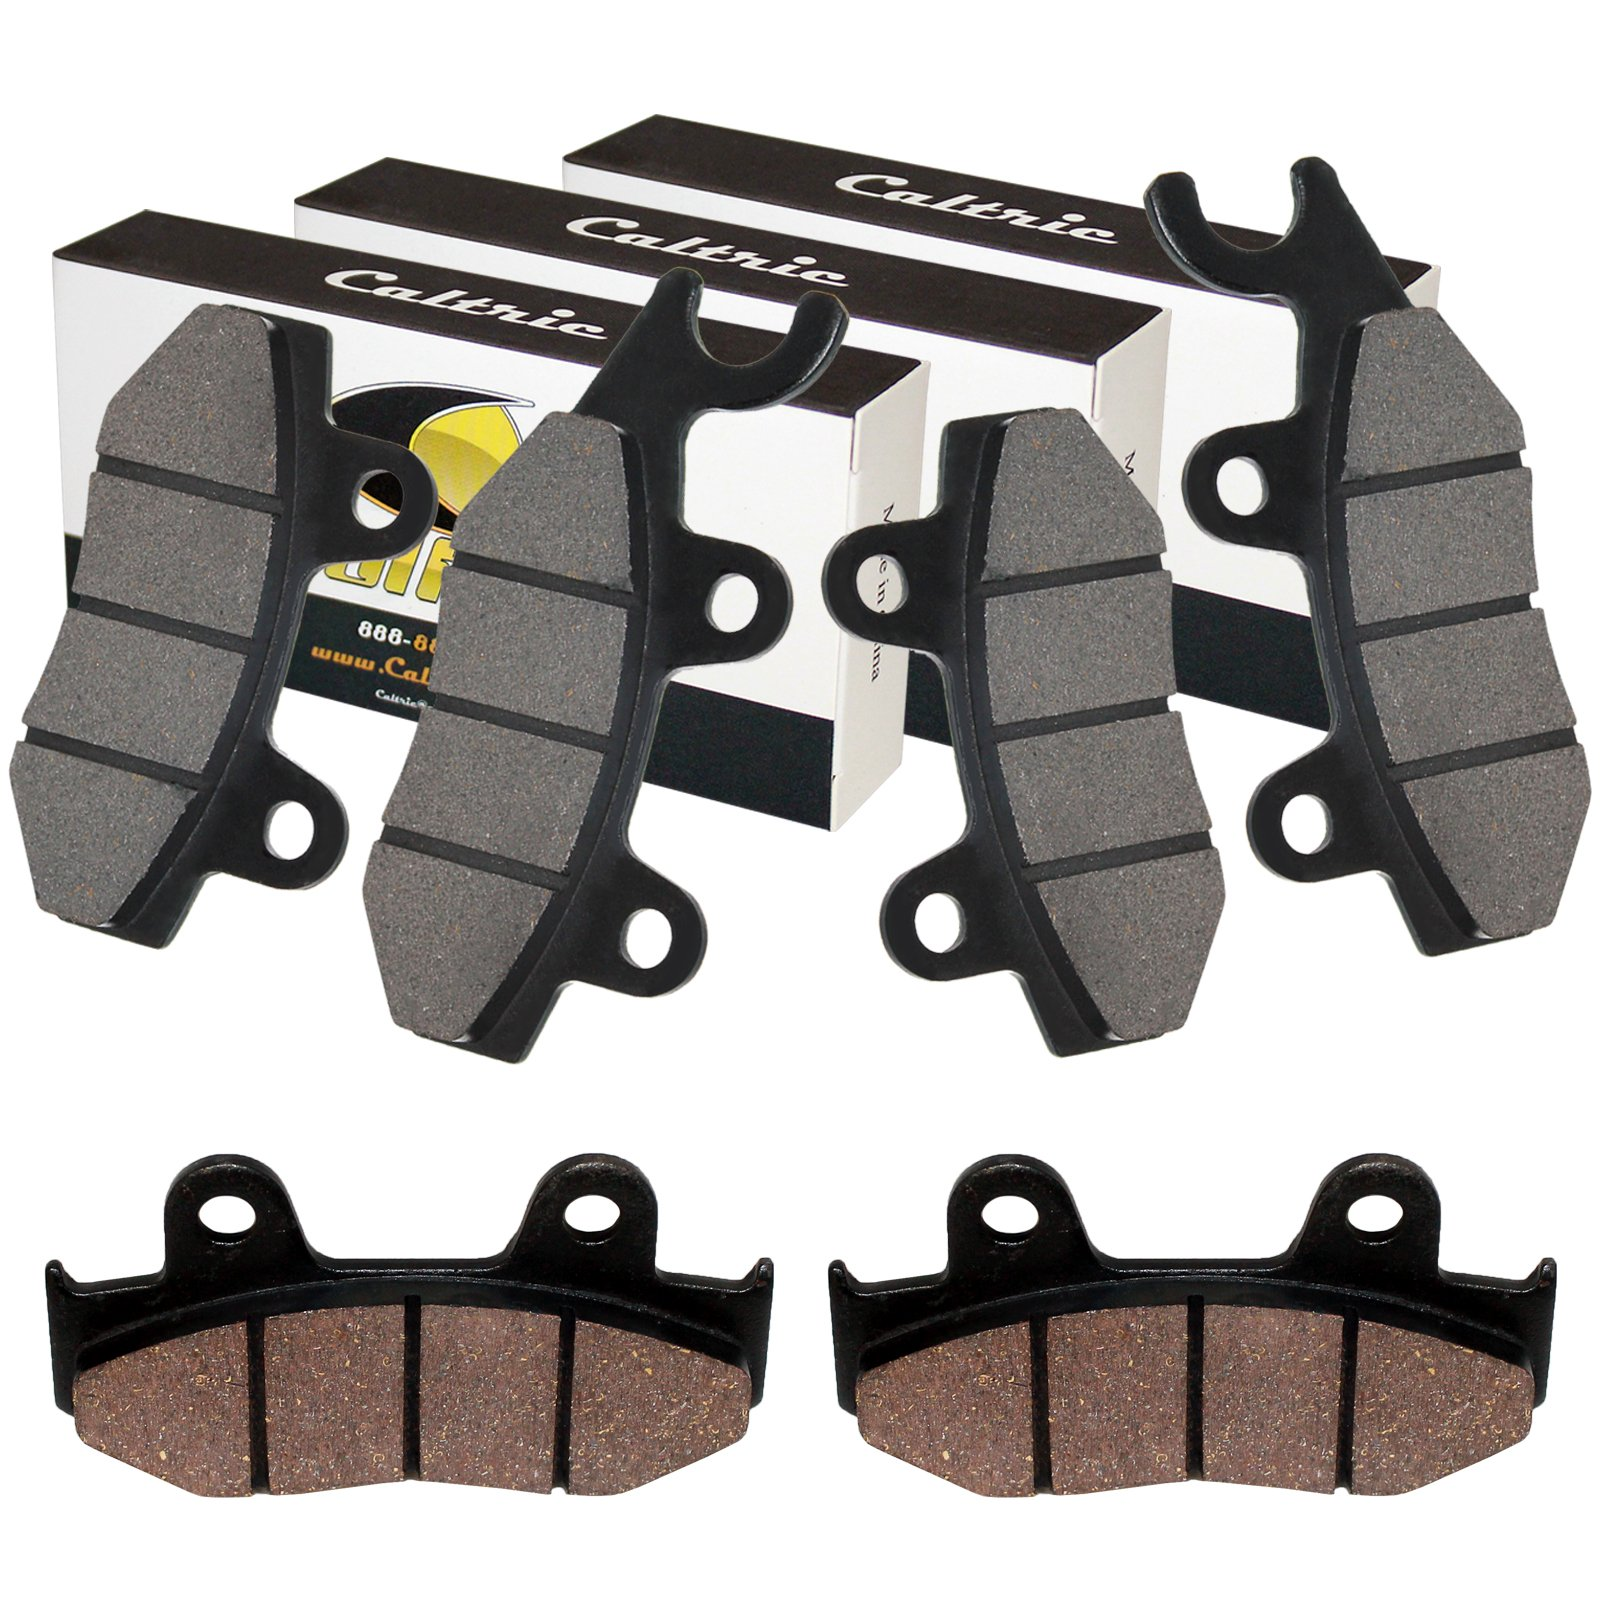 Caltric Front Rear Brake Pads Compatible With Yamaha Raptor 700 700R Yfm700R Yfm 700R 2013 2014-2017